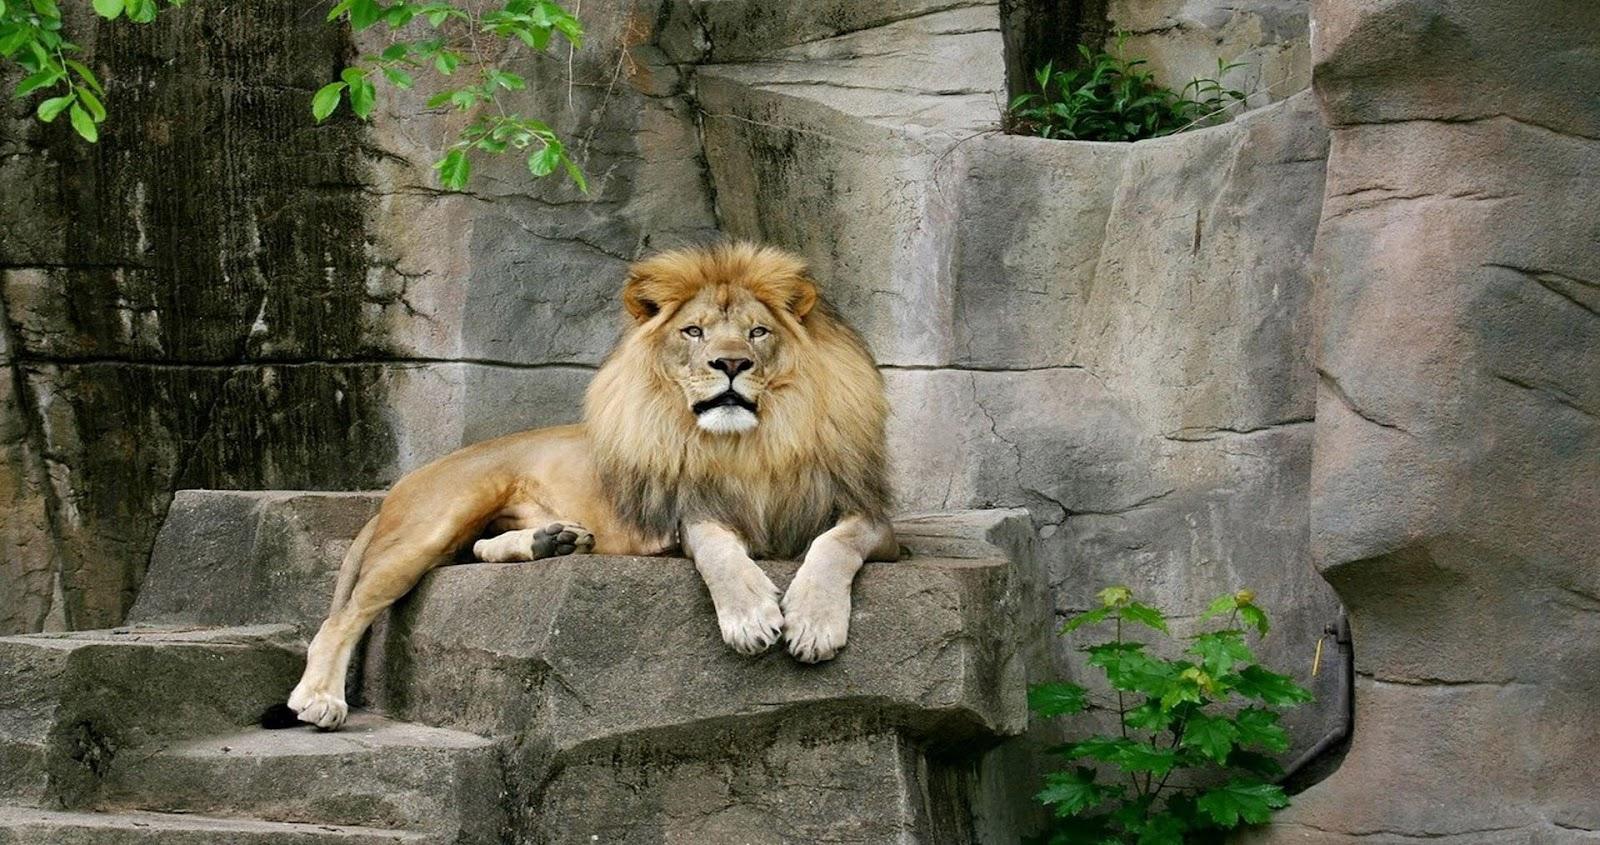 Cute Cubs Wallpaper Lion Full Hd 1080p Wallpapers Latestwallpaper99